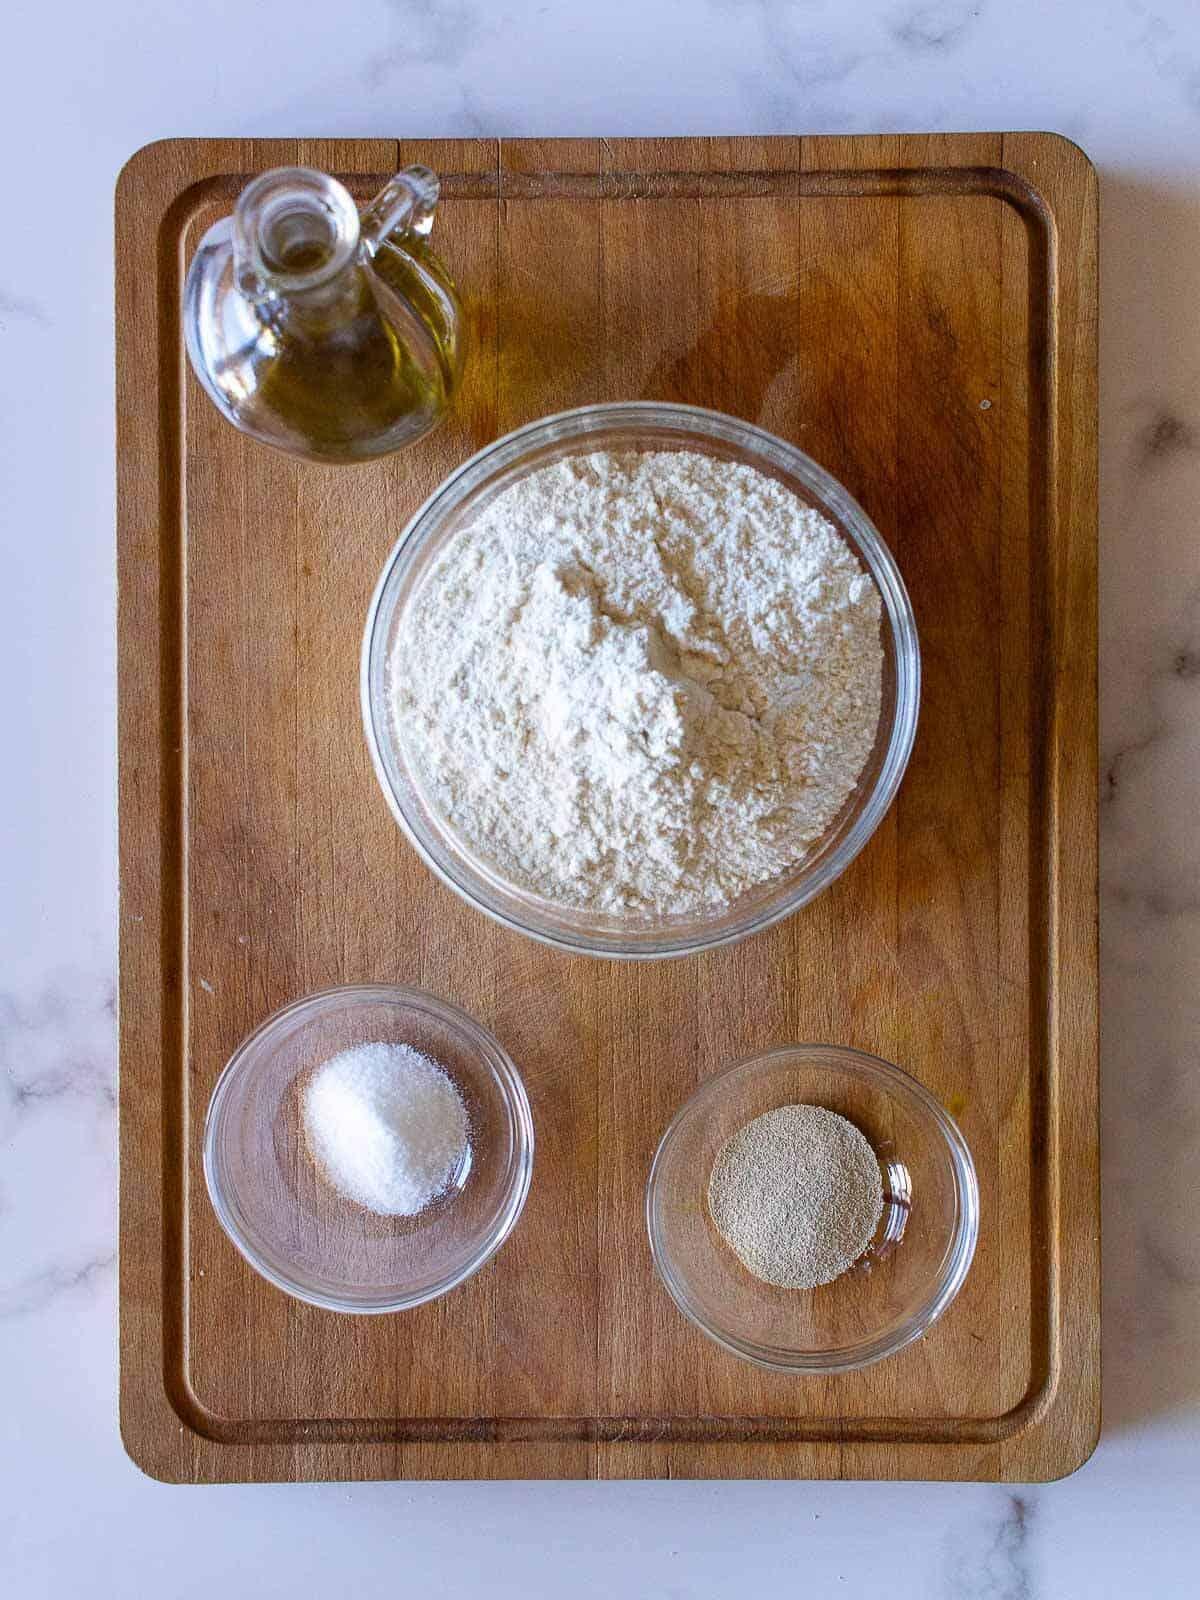 Pagnotta Bread Loaf Ingredients